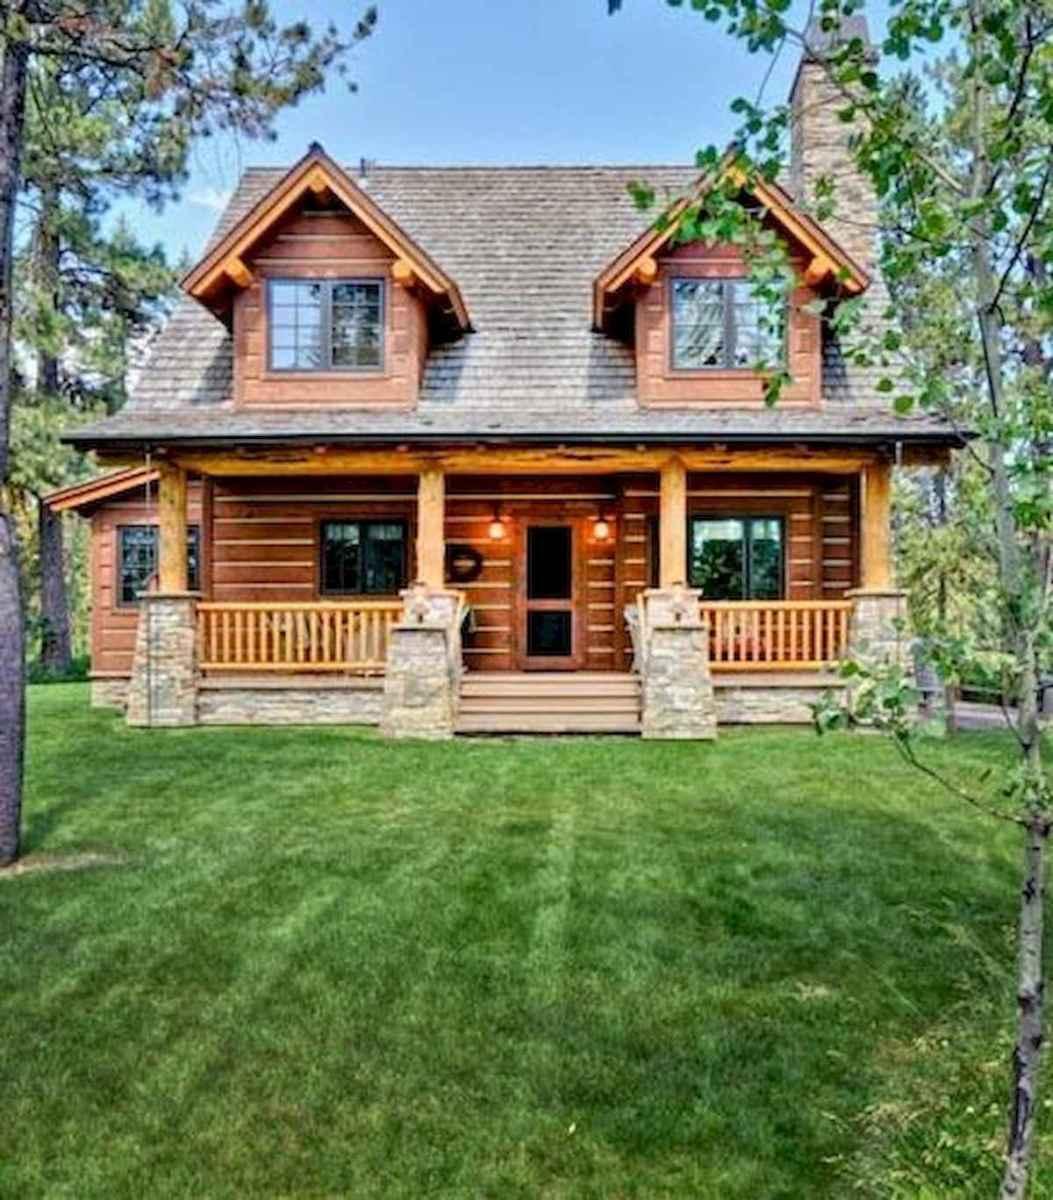 75 Great Log Cabin Homes Plans Design Ideas (4)